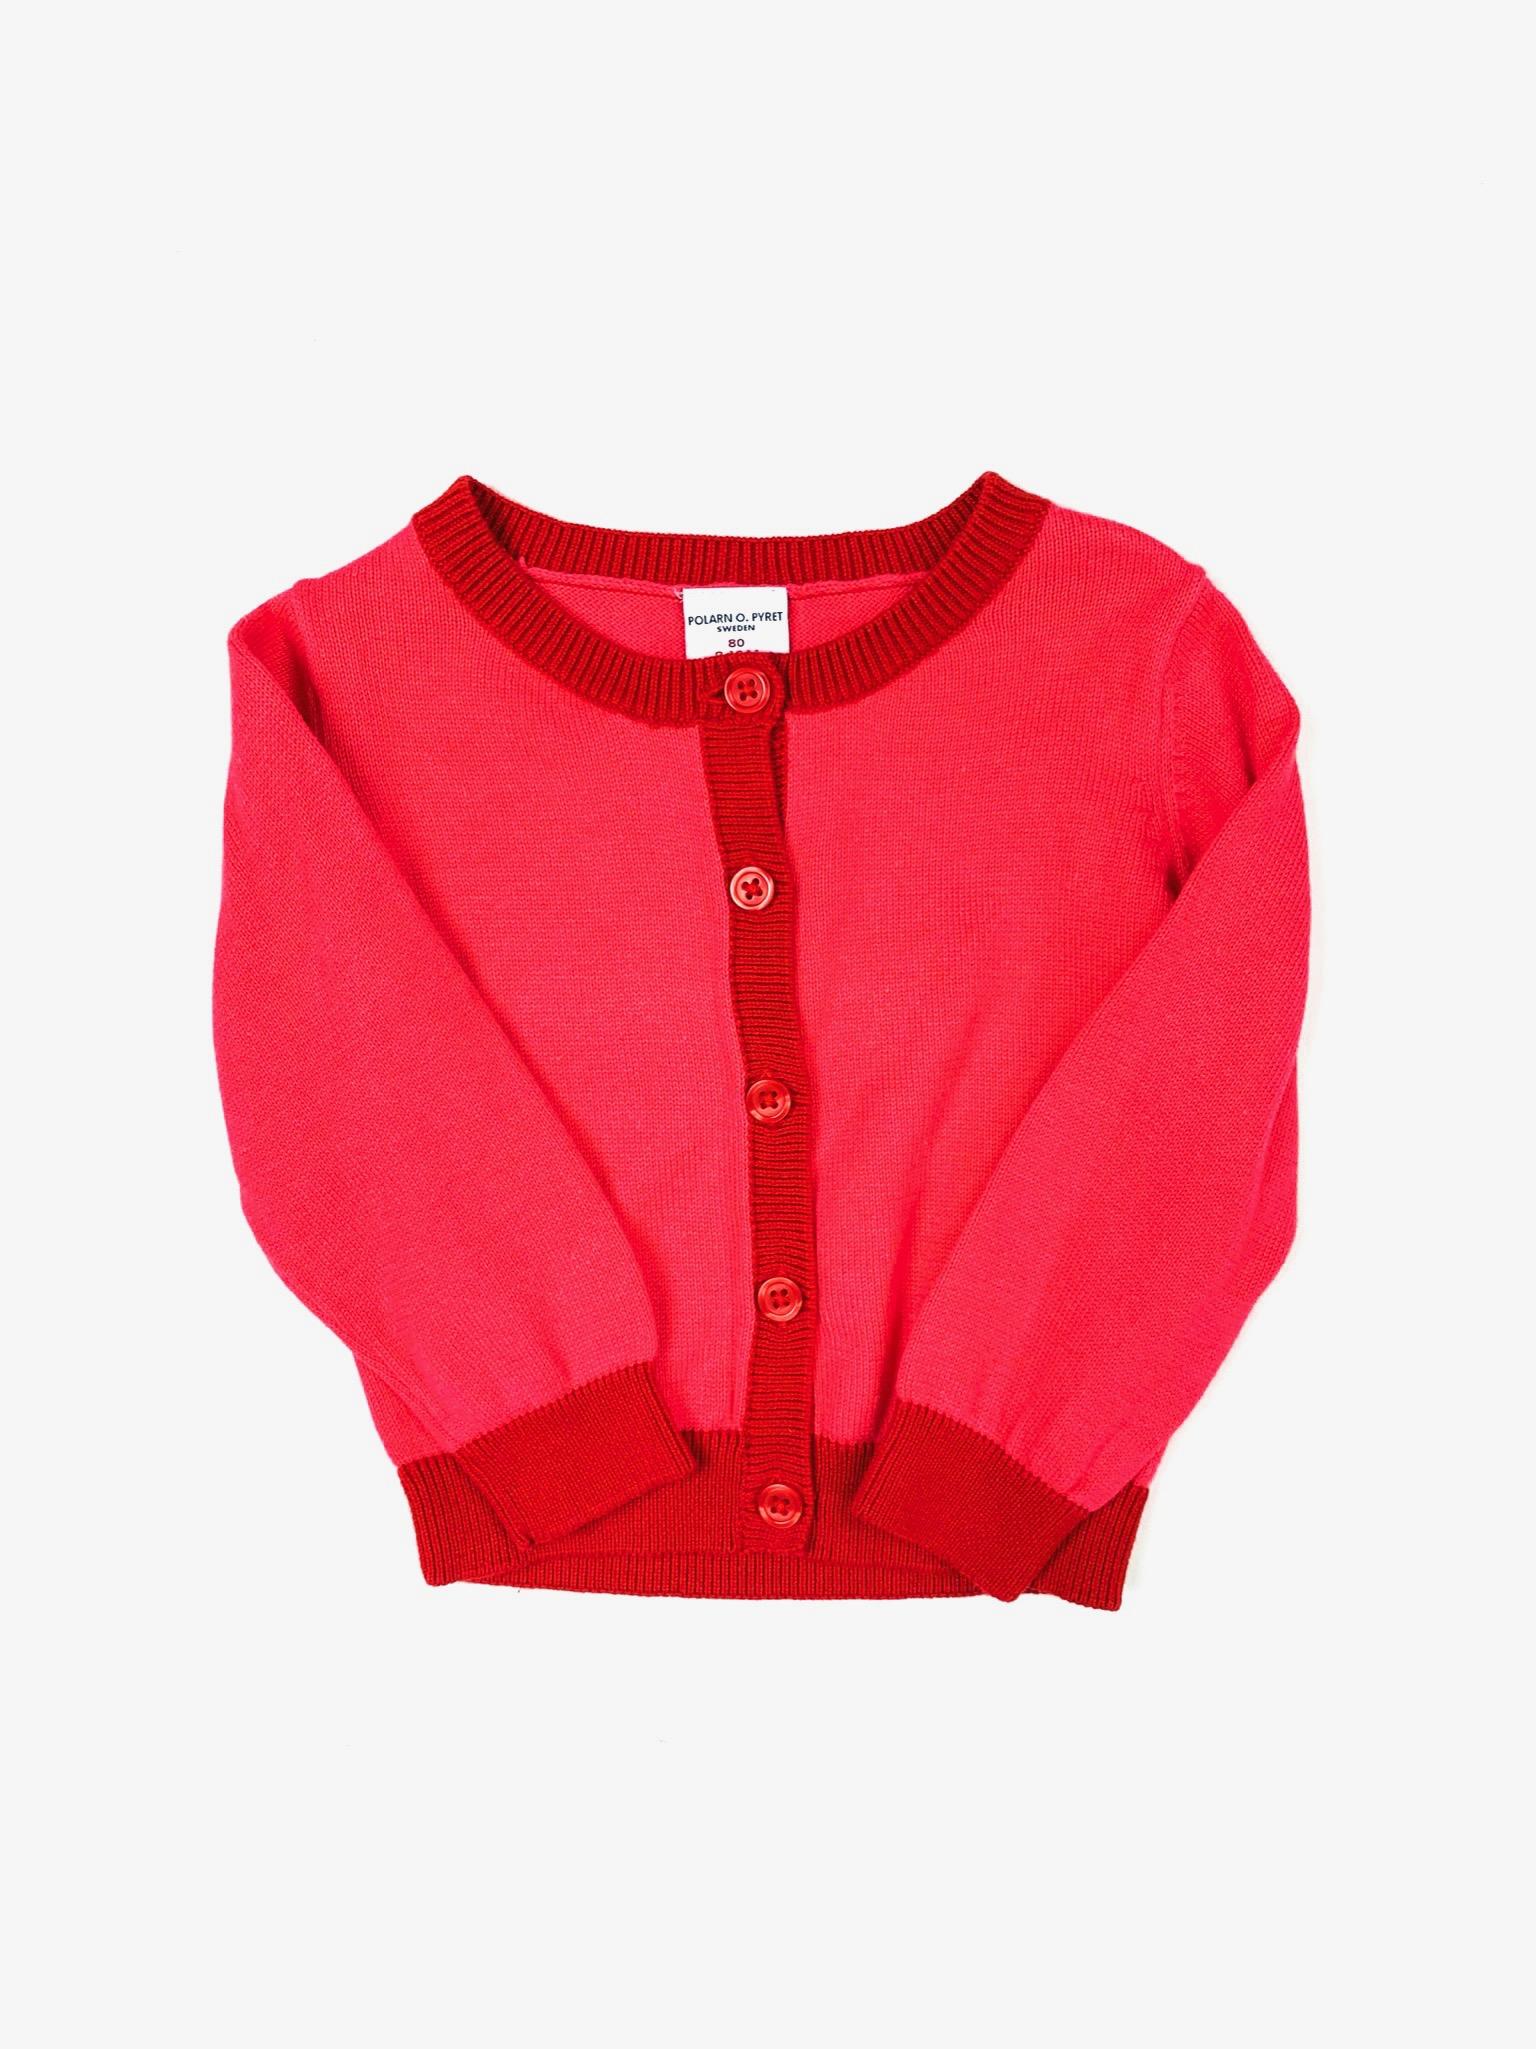 Polarn O. Pryet  9-12M Sweaters/Sweatshirts